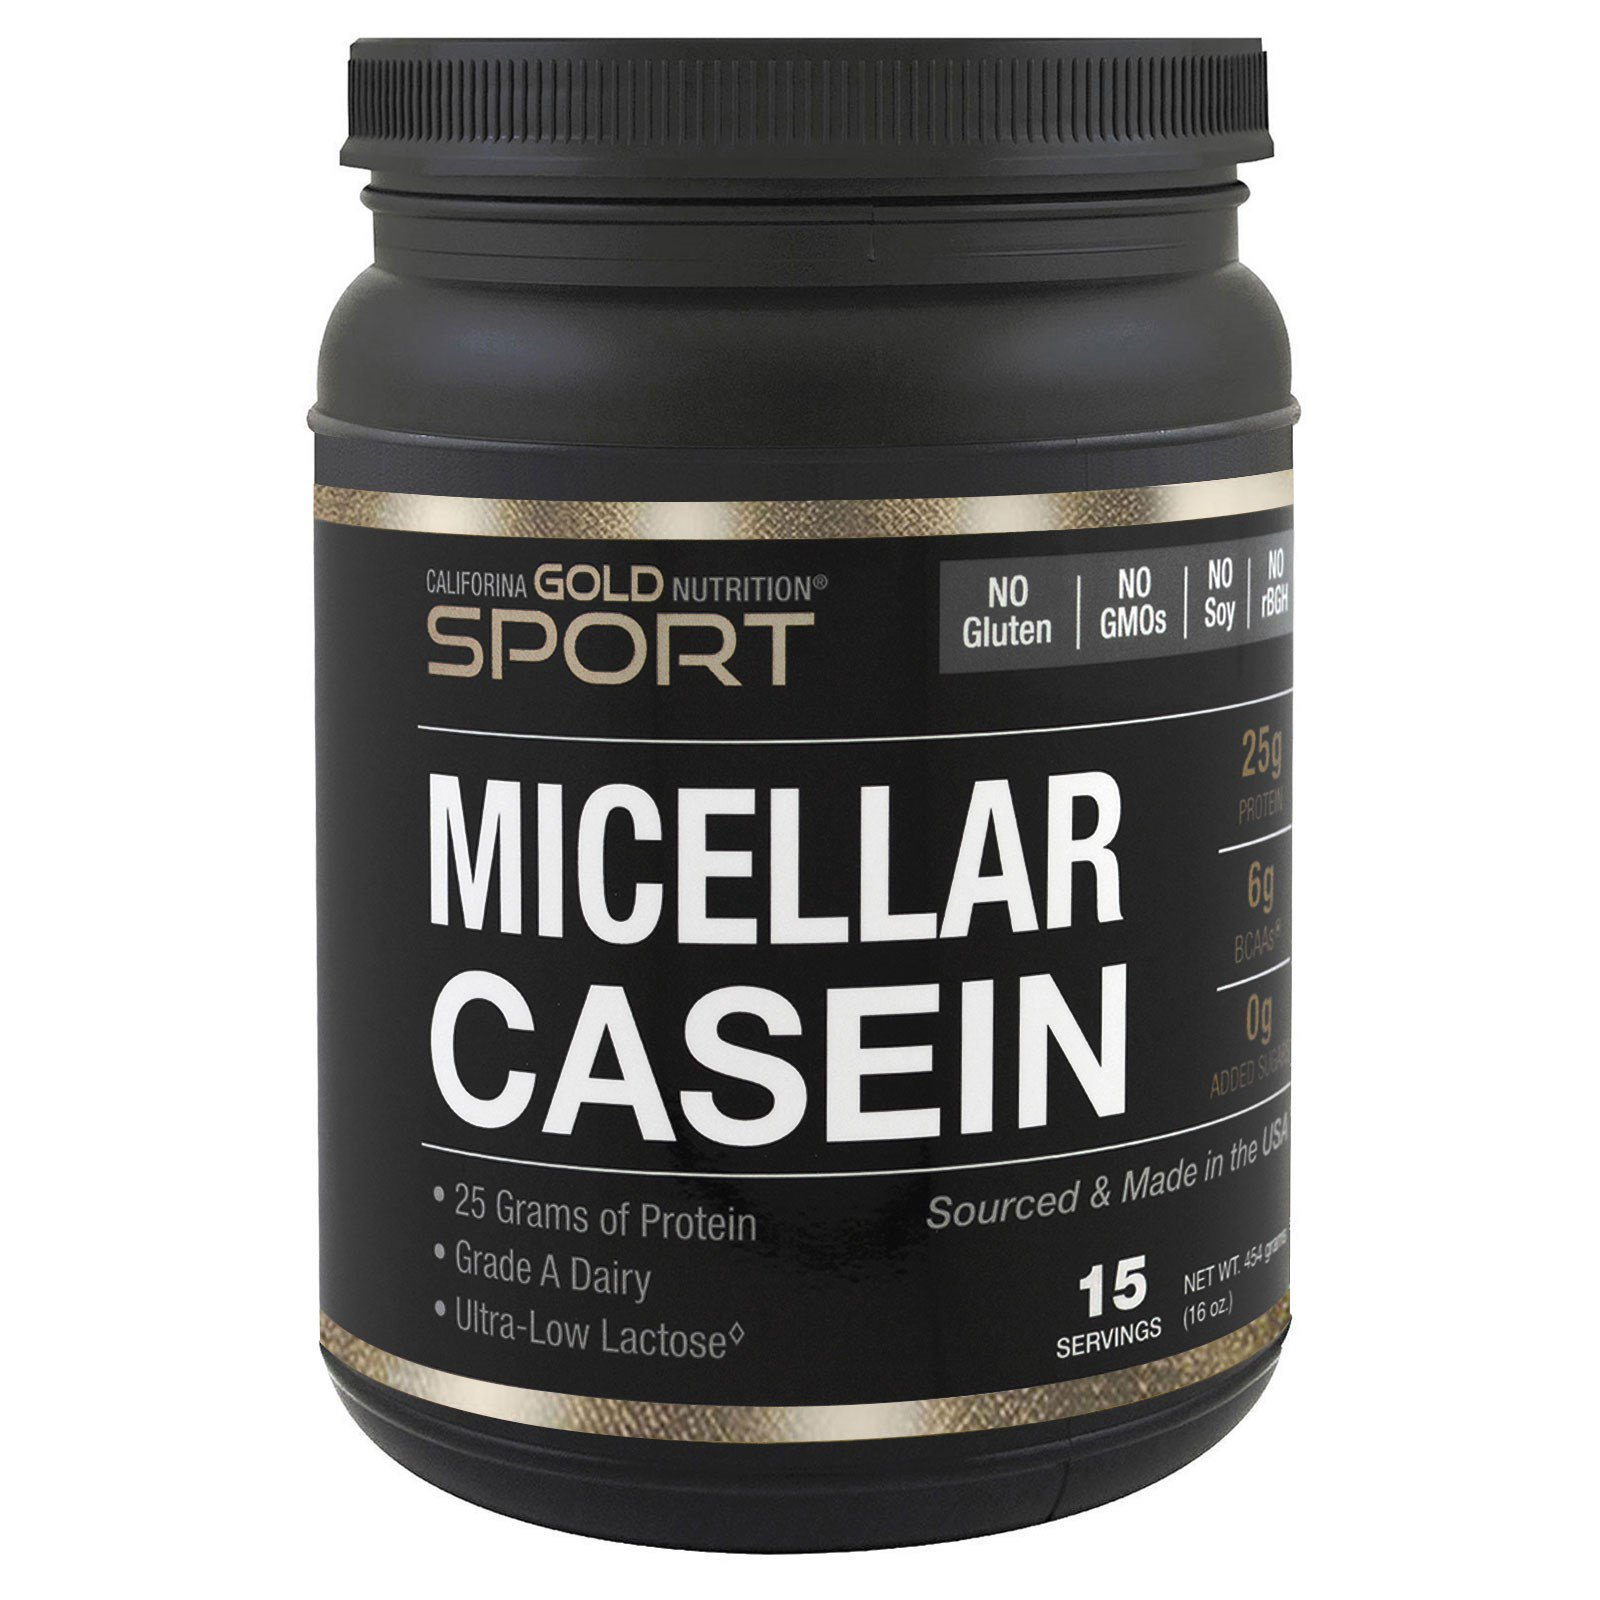 California Gold Nutrition Sport Micellar Casein Protein